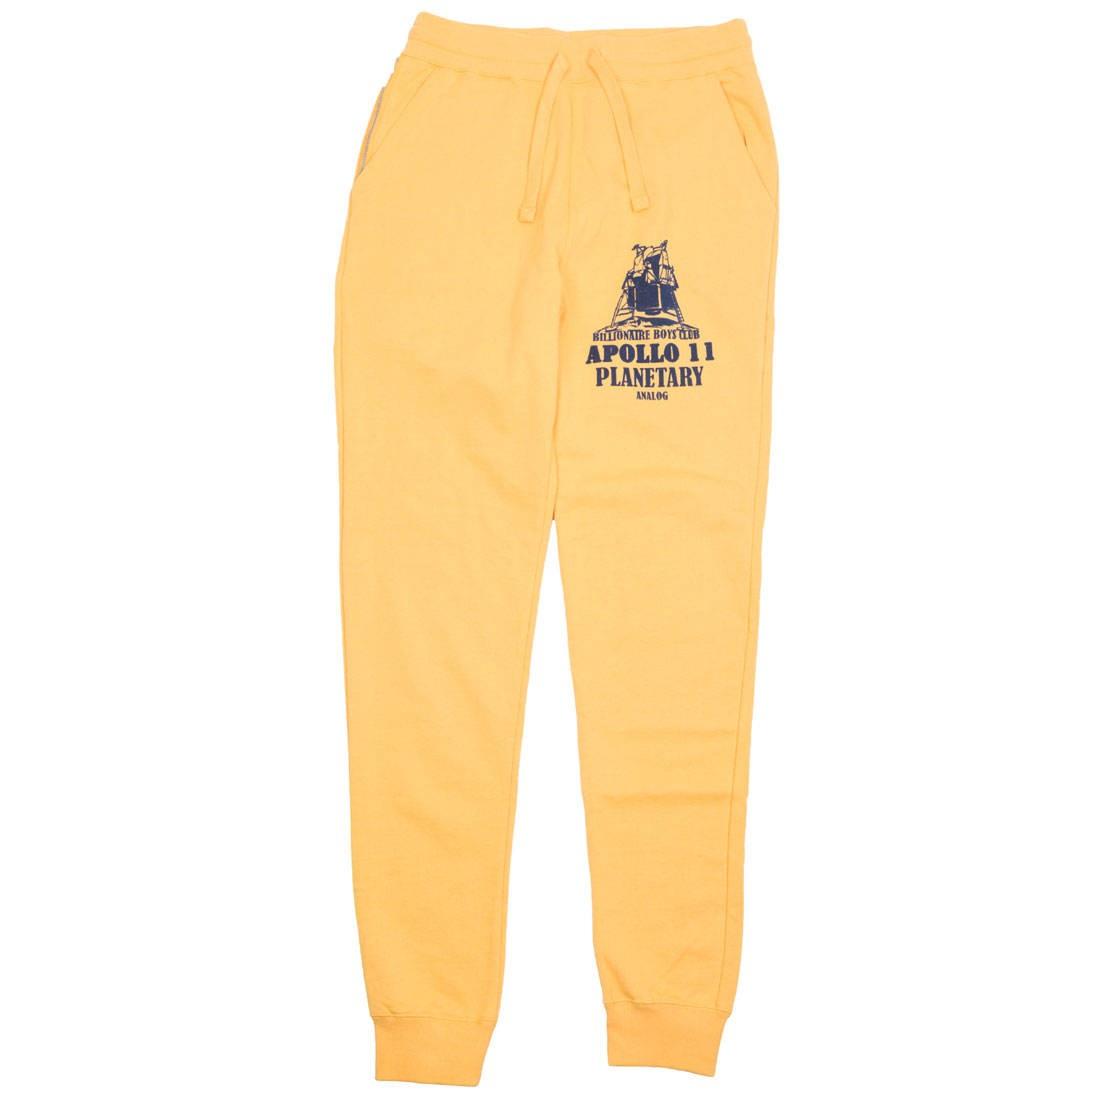 Billionaire Boys Club Men Club Sweatpants (yellow / beeswax)